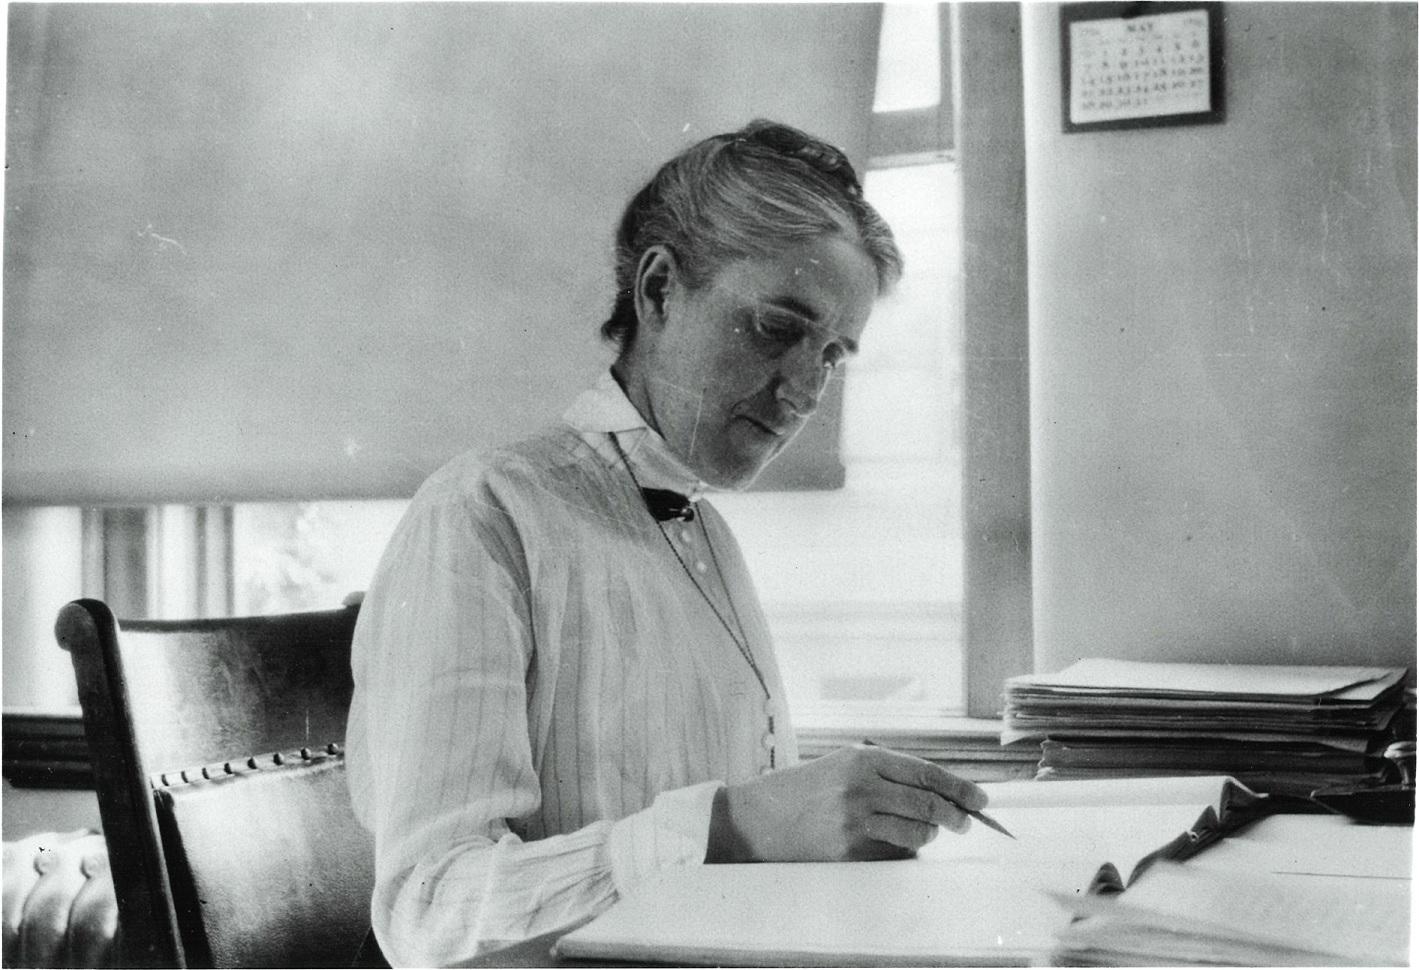 Henrietta Swan Leavitt: Discovered How to Measure Stellar Distances